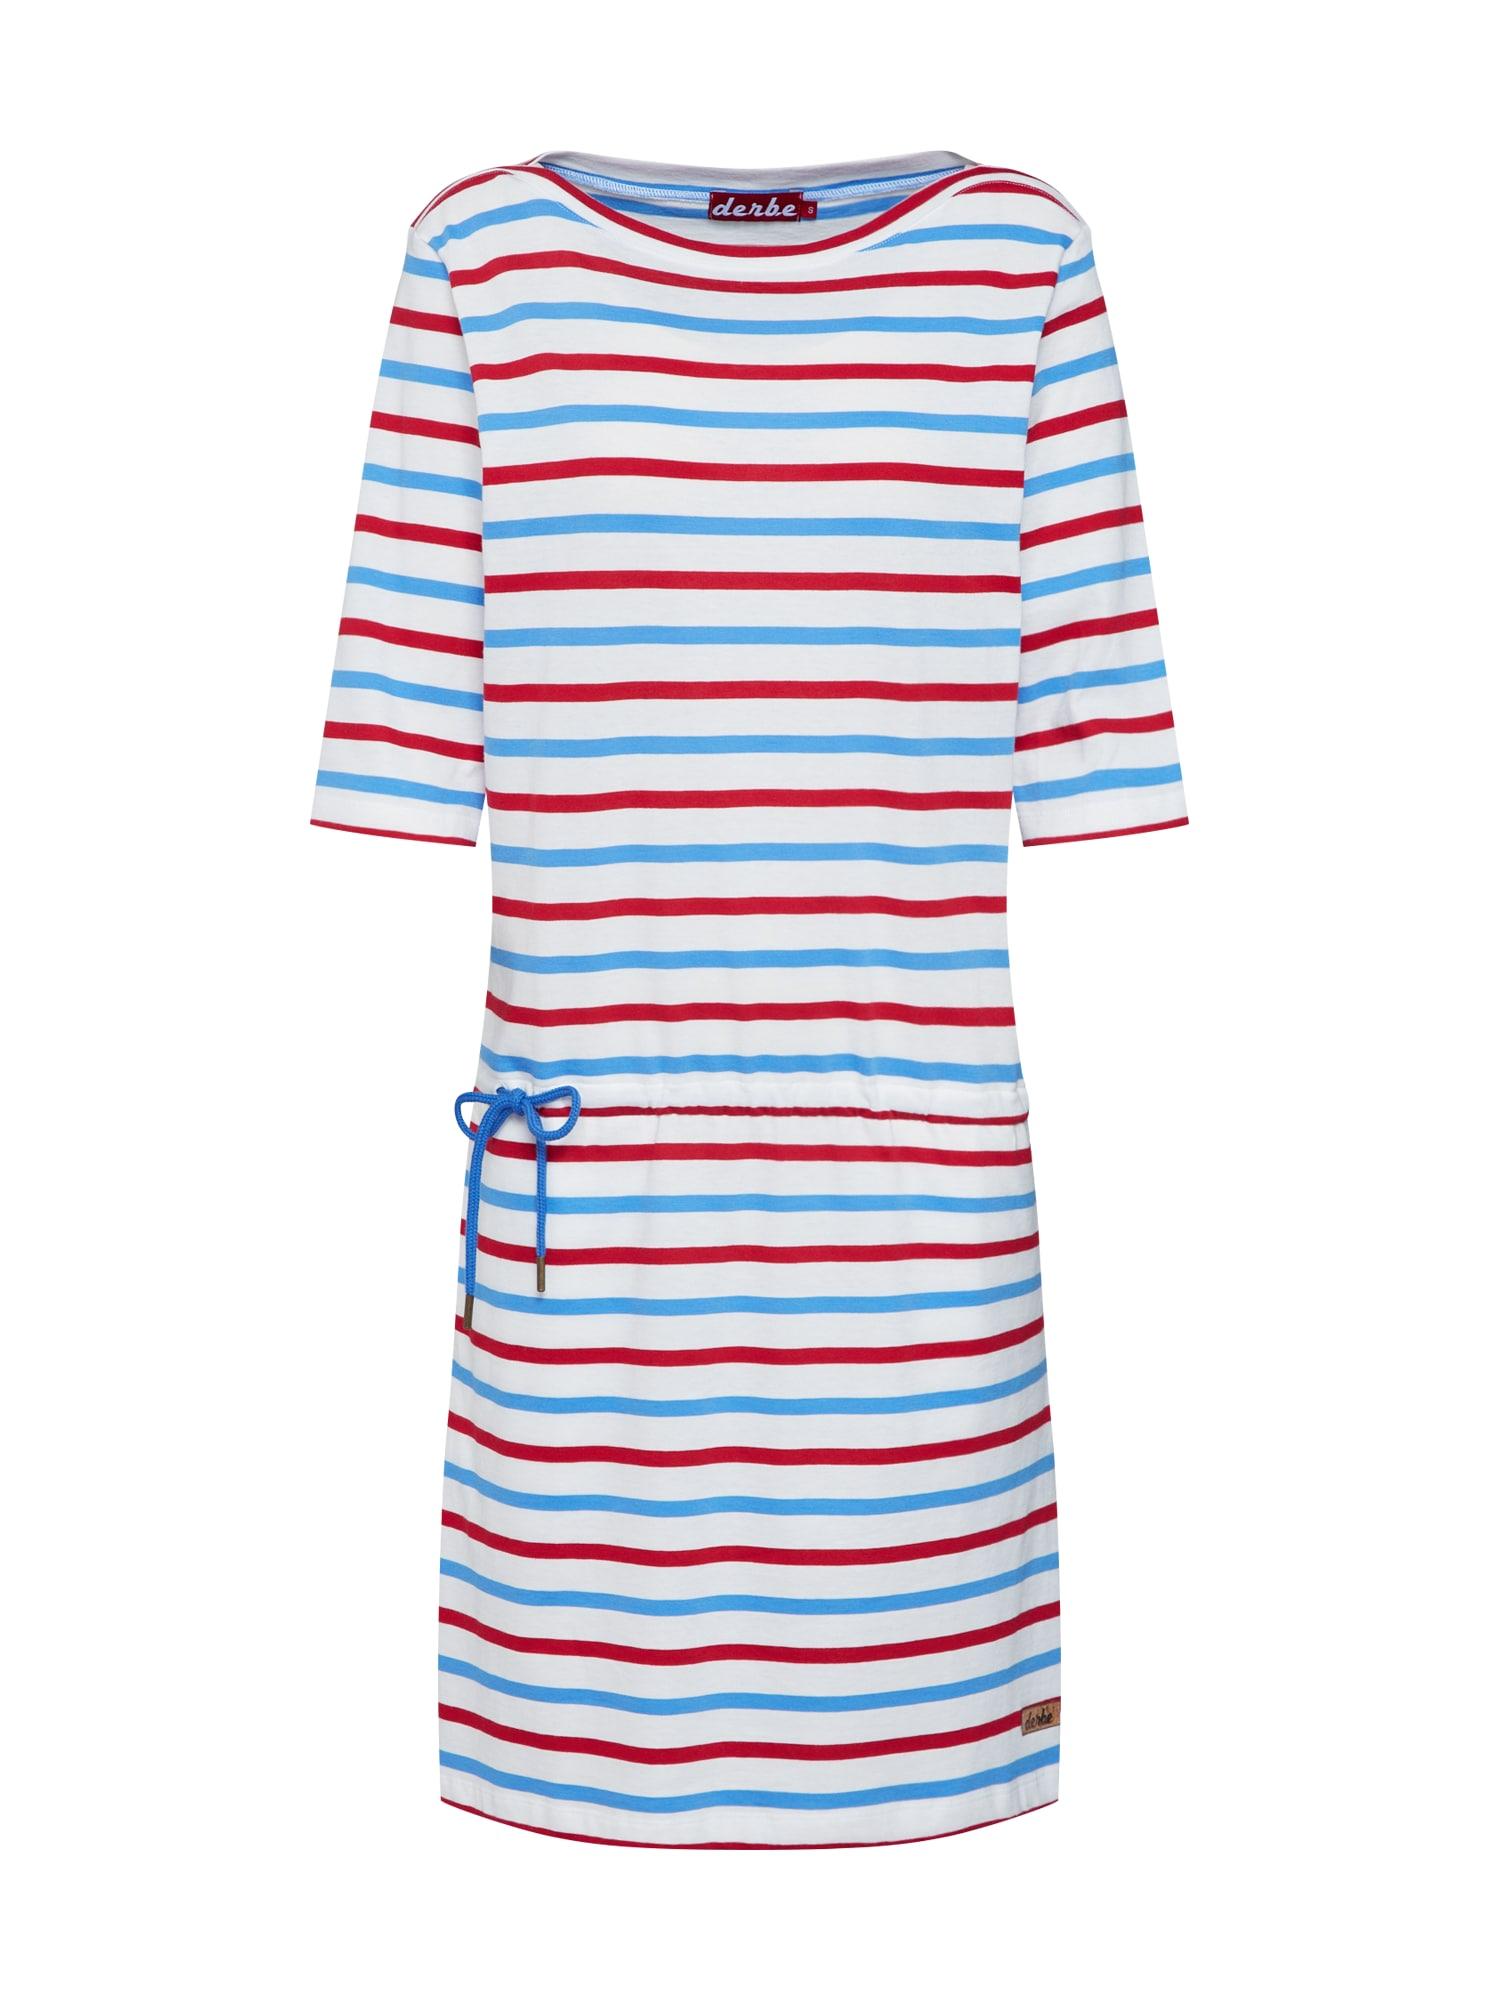 Šaty Holyharbor modrá červená bílá Derbe